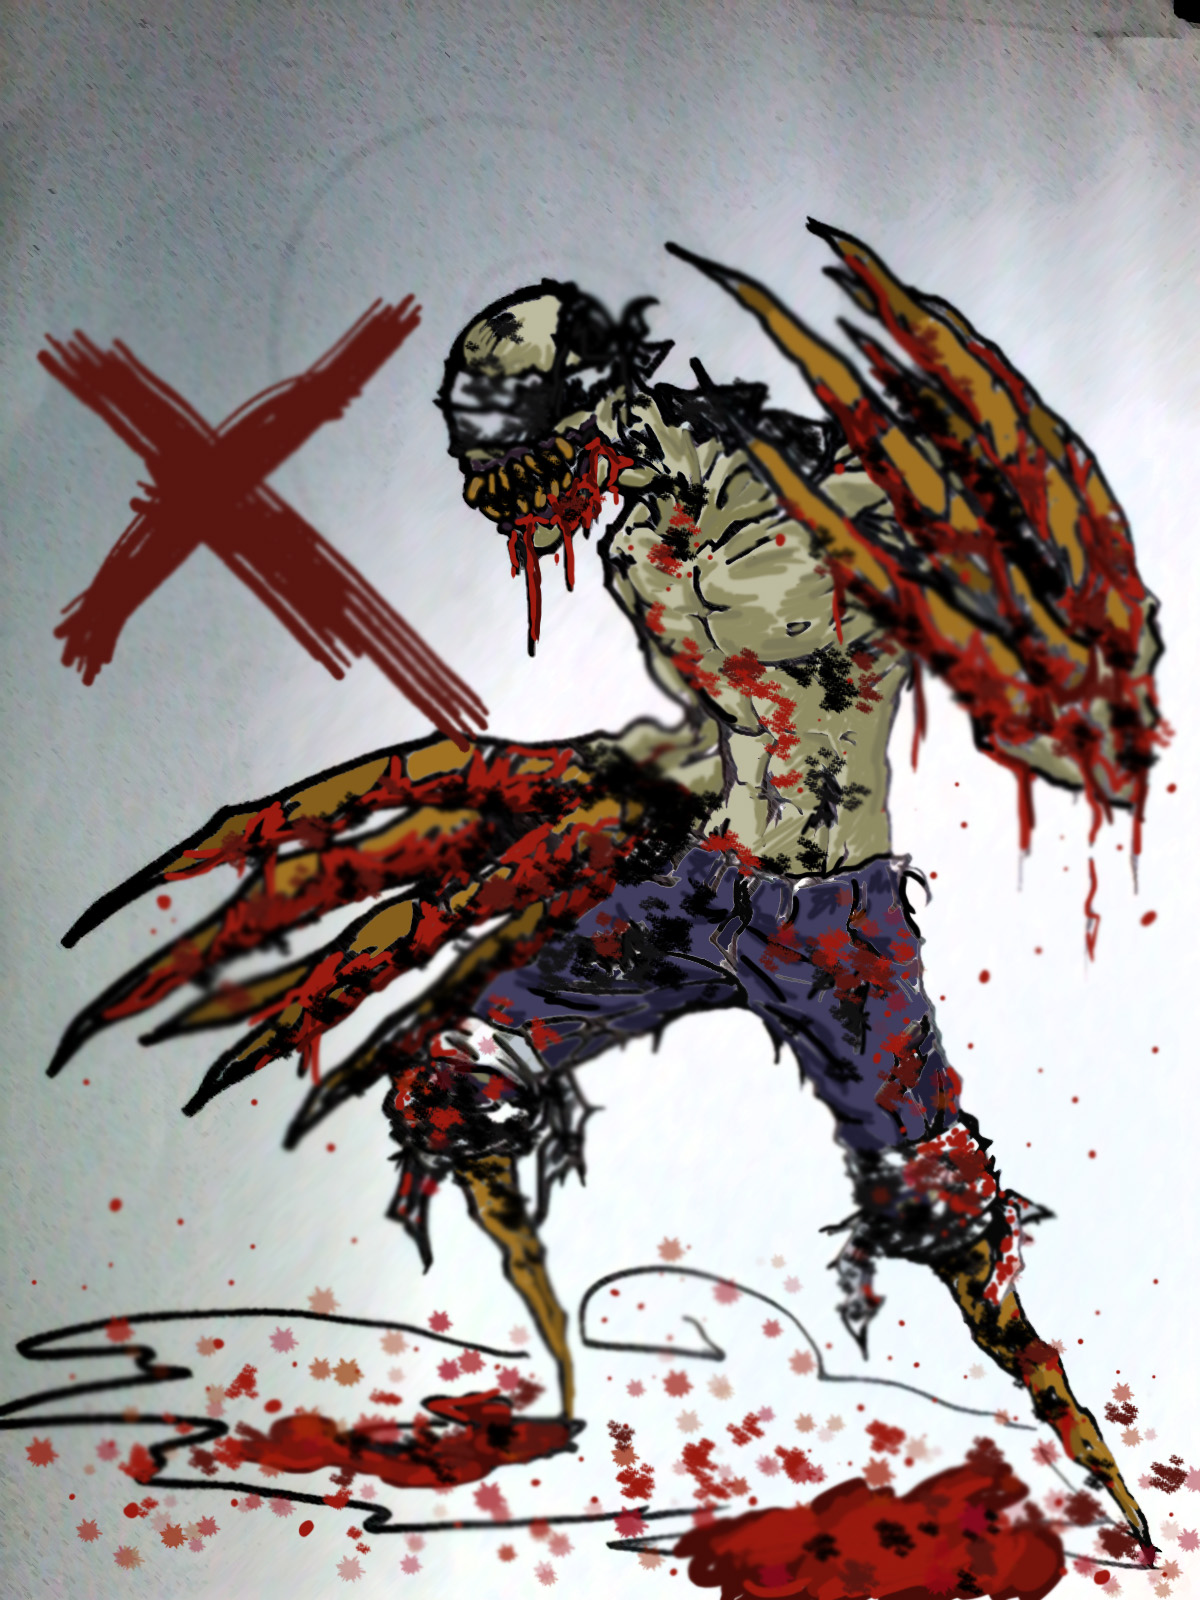 Bandage Claw Zombie